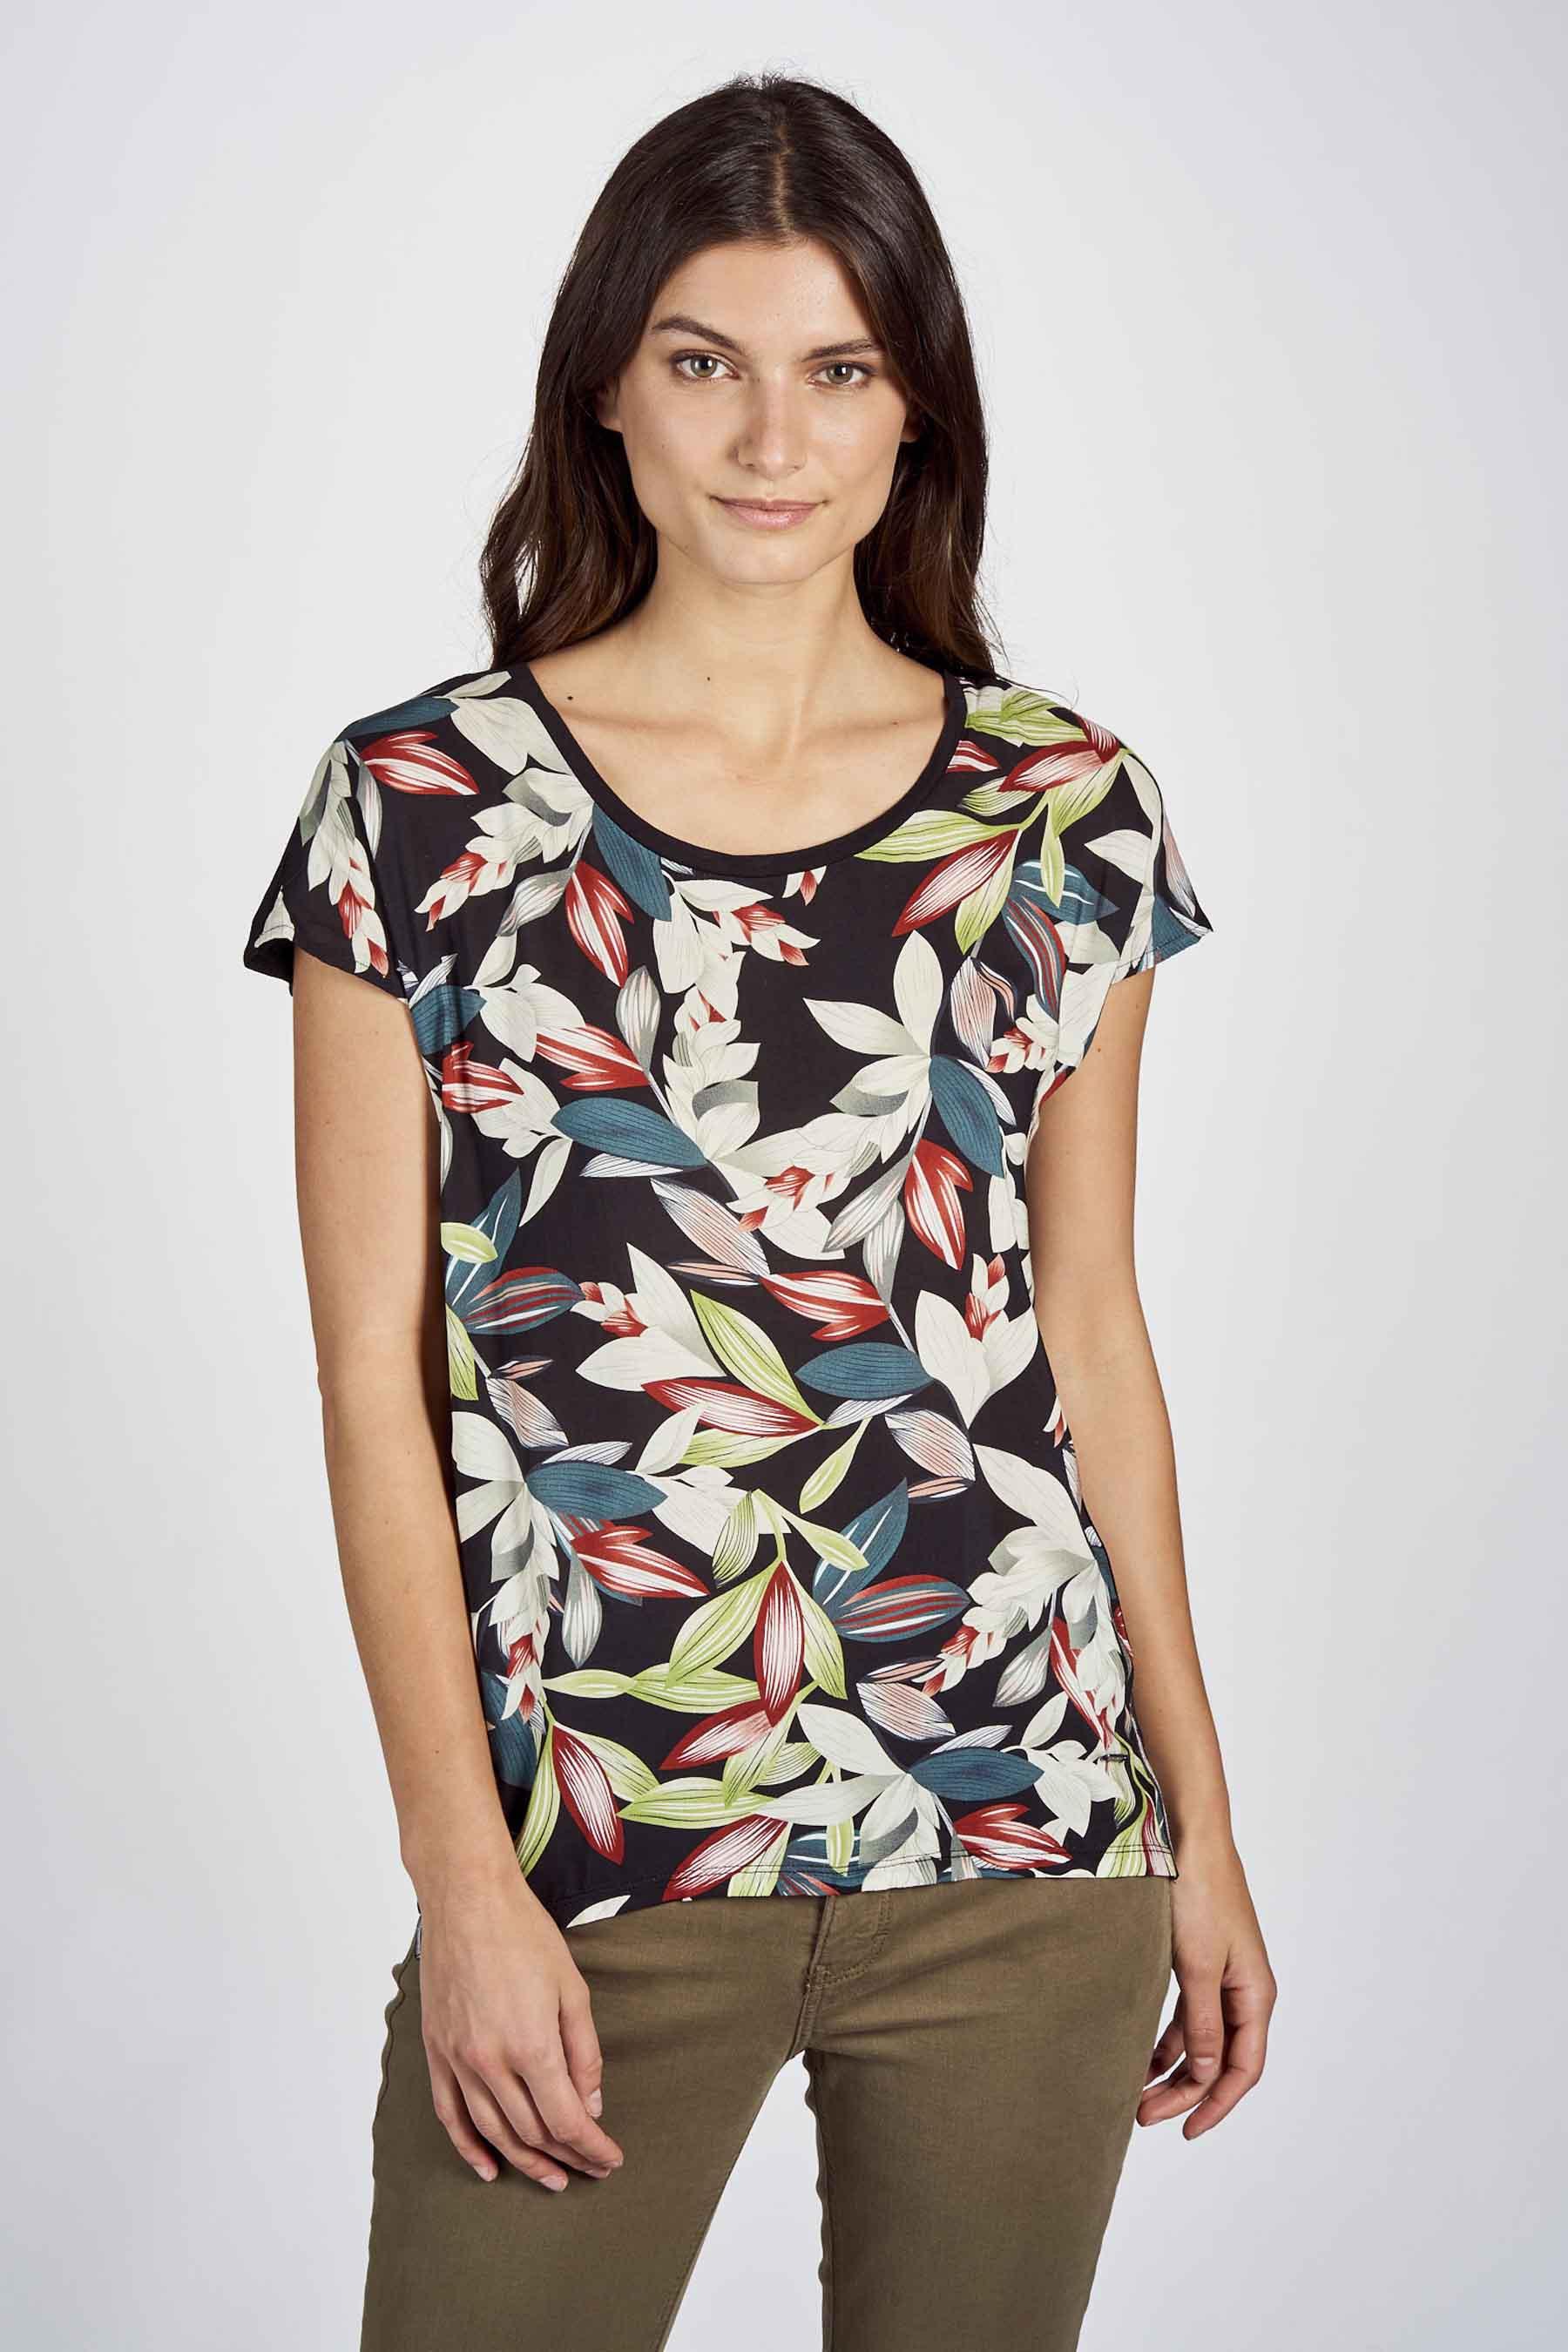 Zabaione Blouse korte mouwen, Multicolor, Dames, Maat: L/M/S/XL